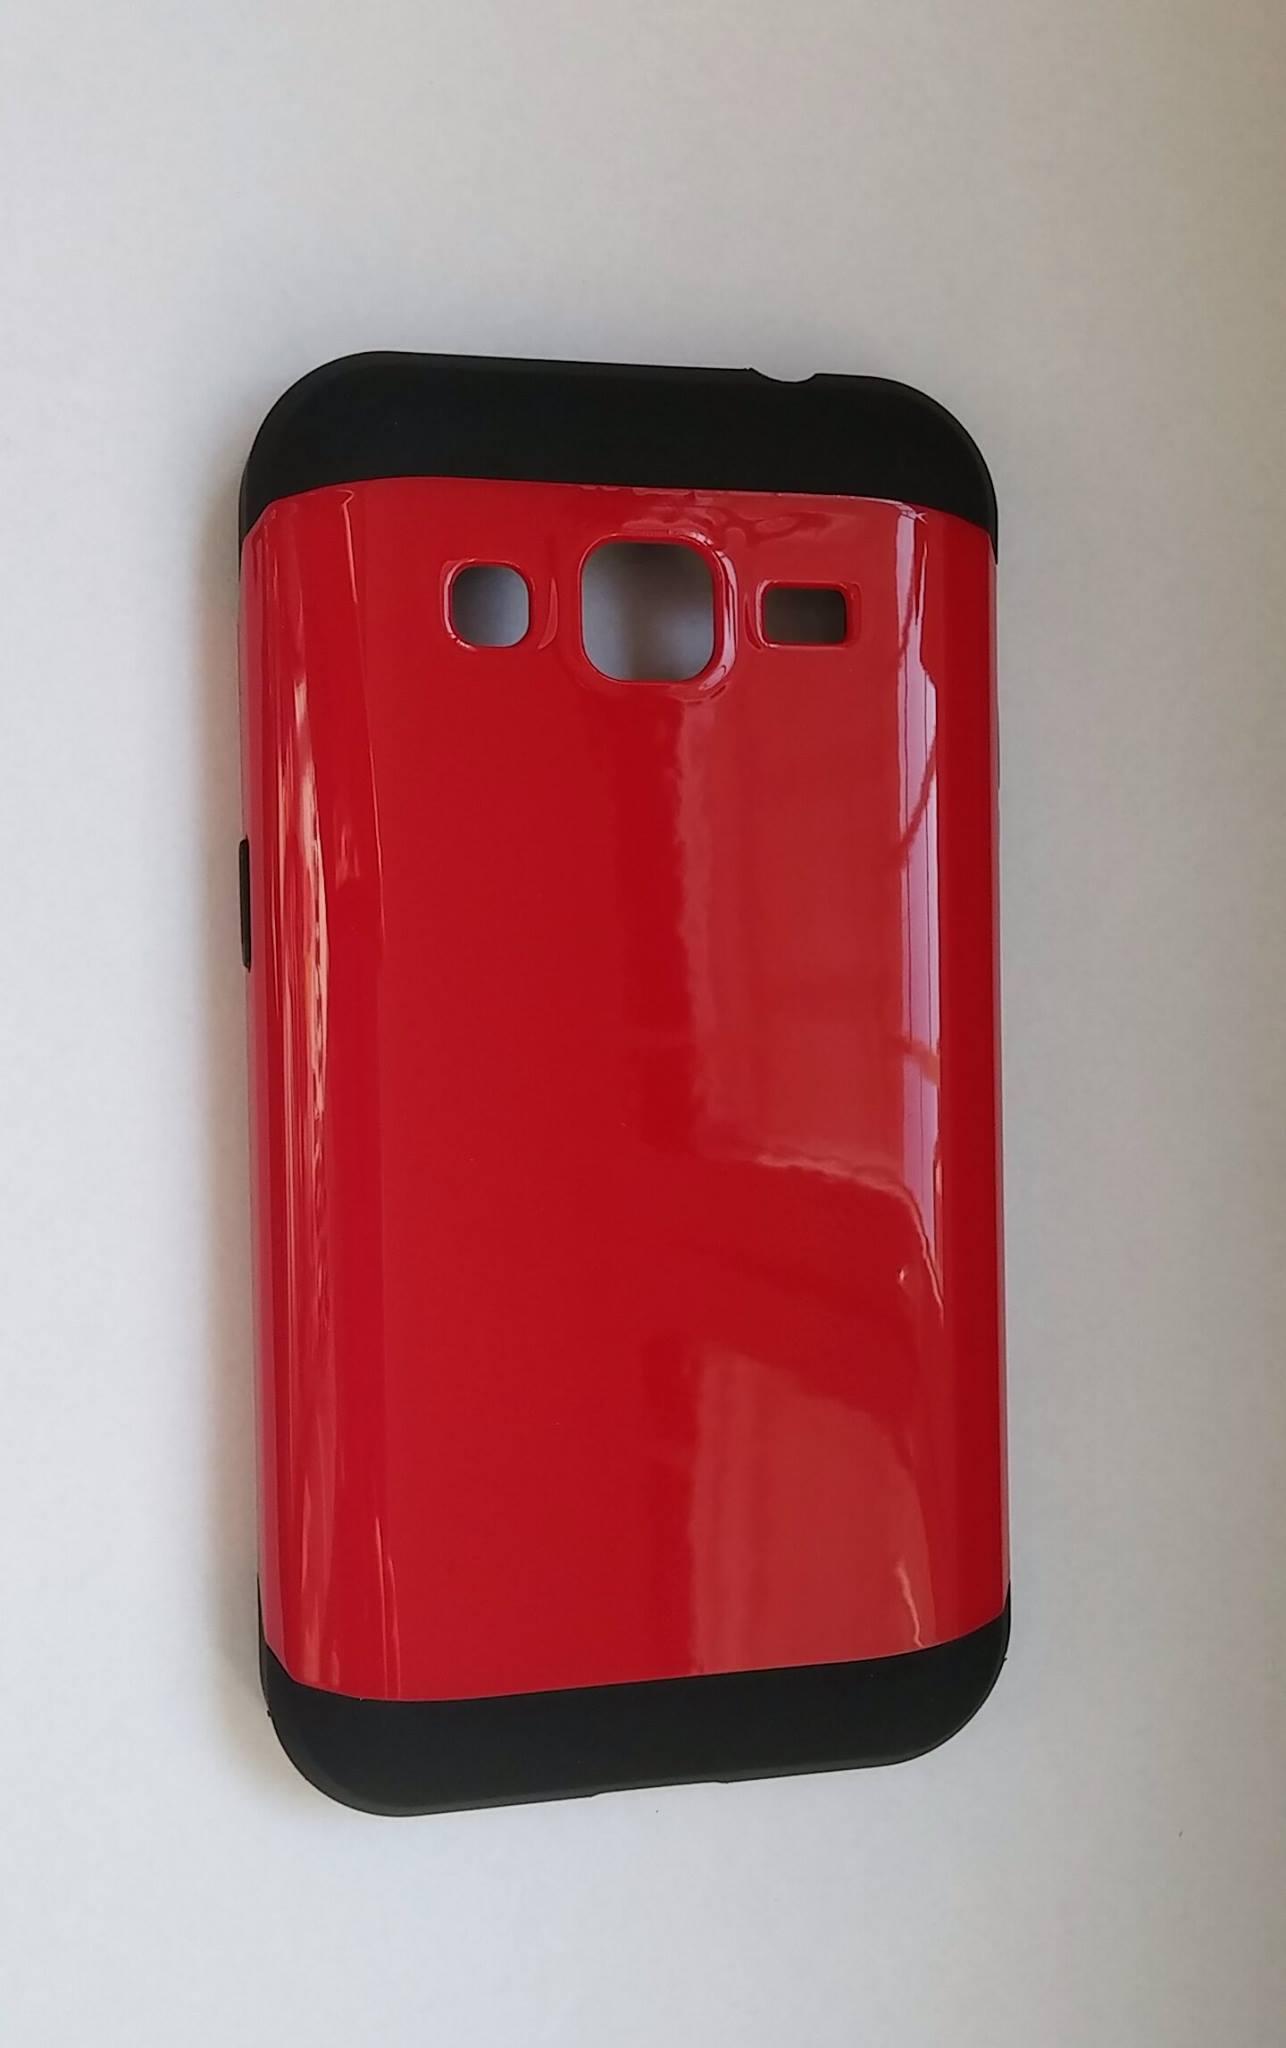 Odolné pouzdro HYBRID CASE na mobilní telefon Samsung Galaxy Core Prime RED (Odolný kryt či obal na mobil Samsung Galaxy Core Prime G360 / VE G361)